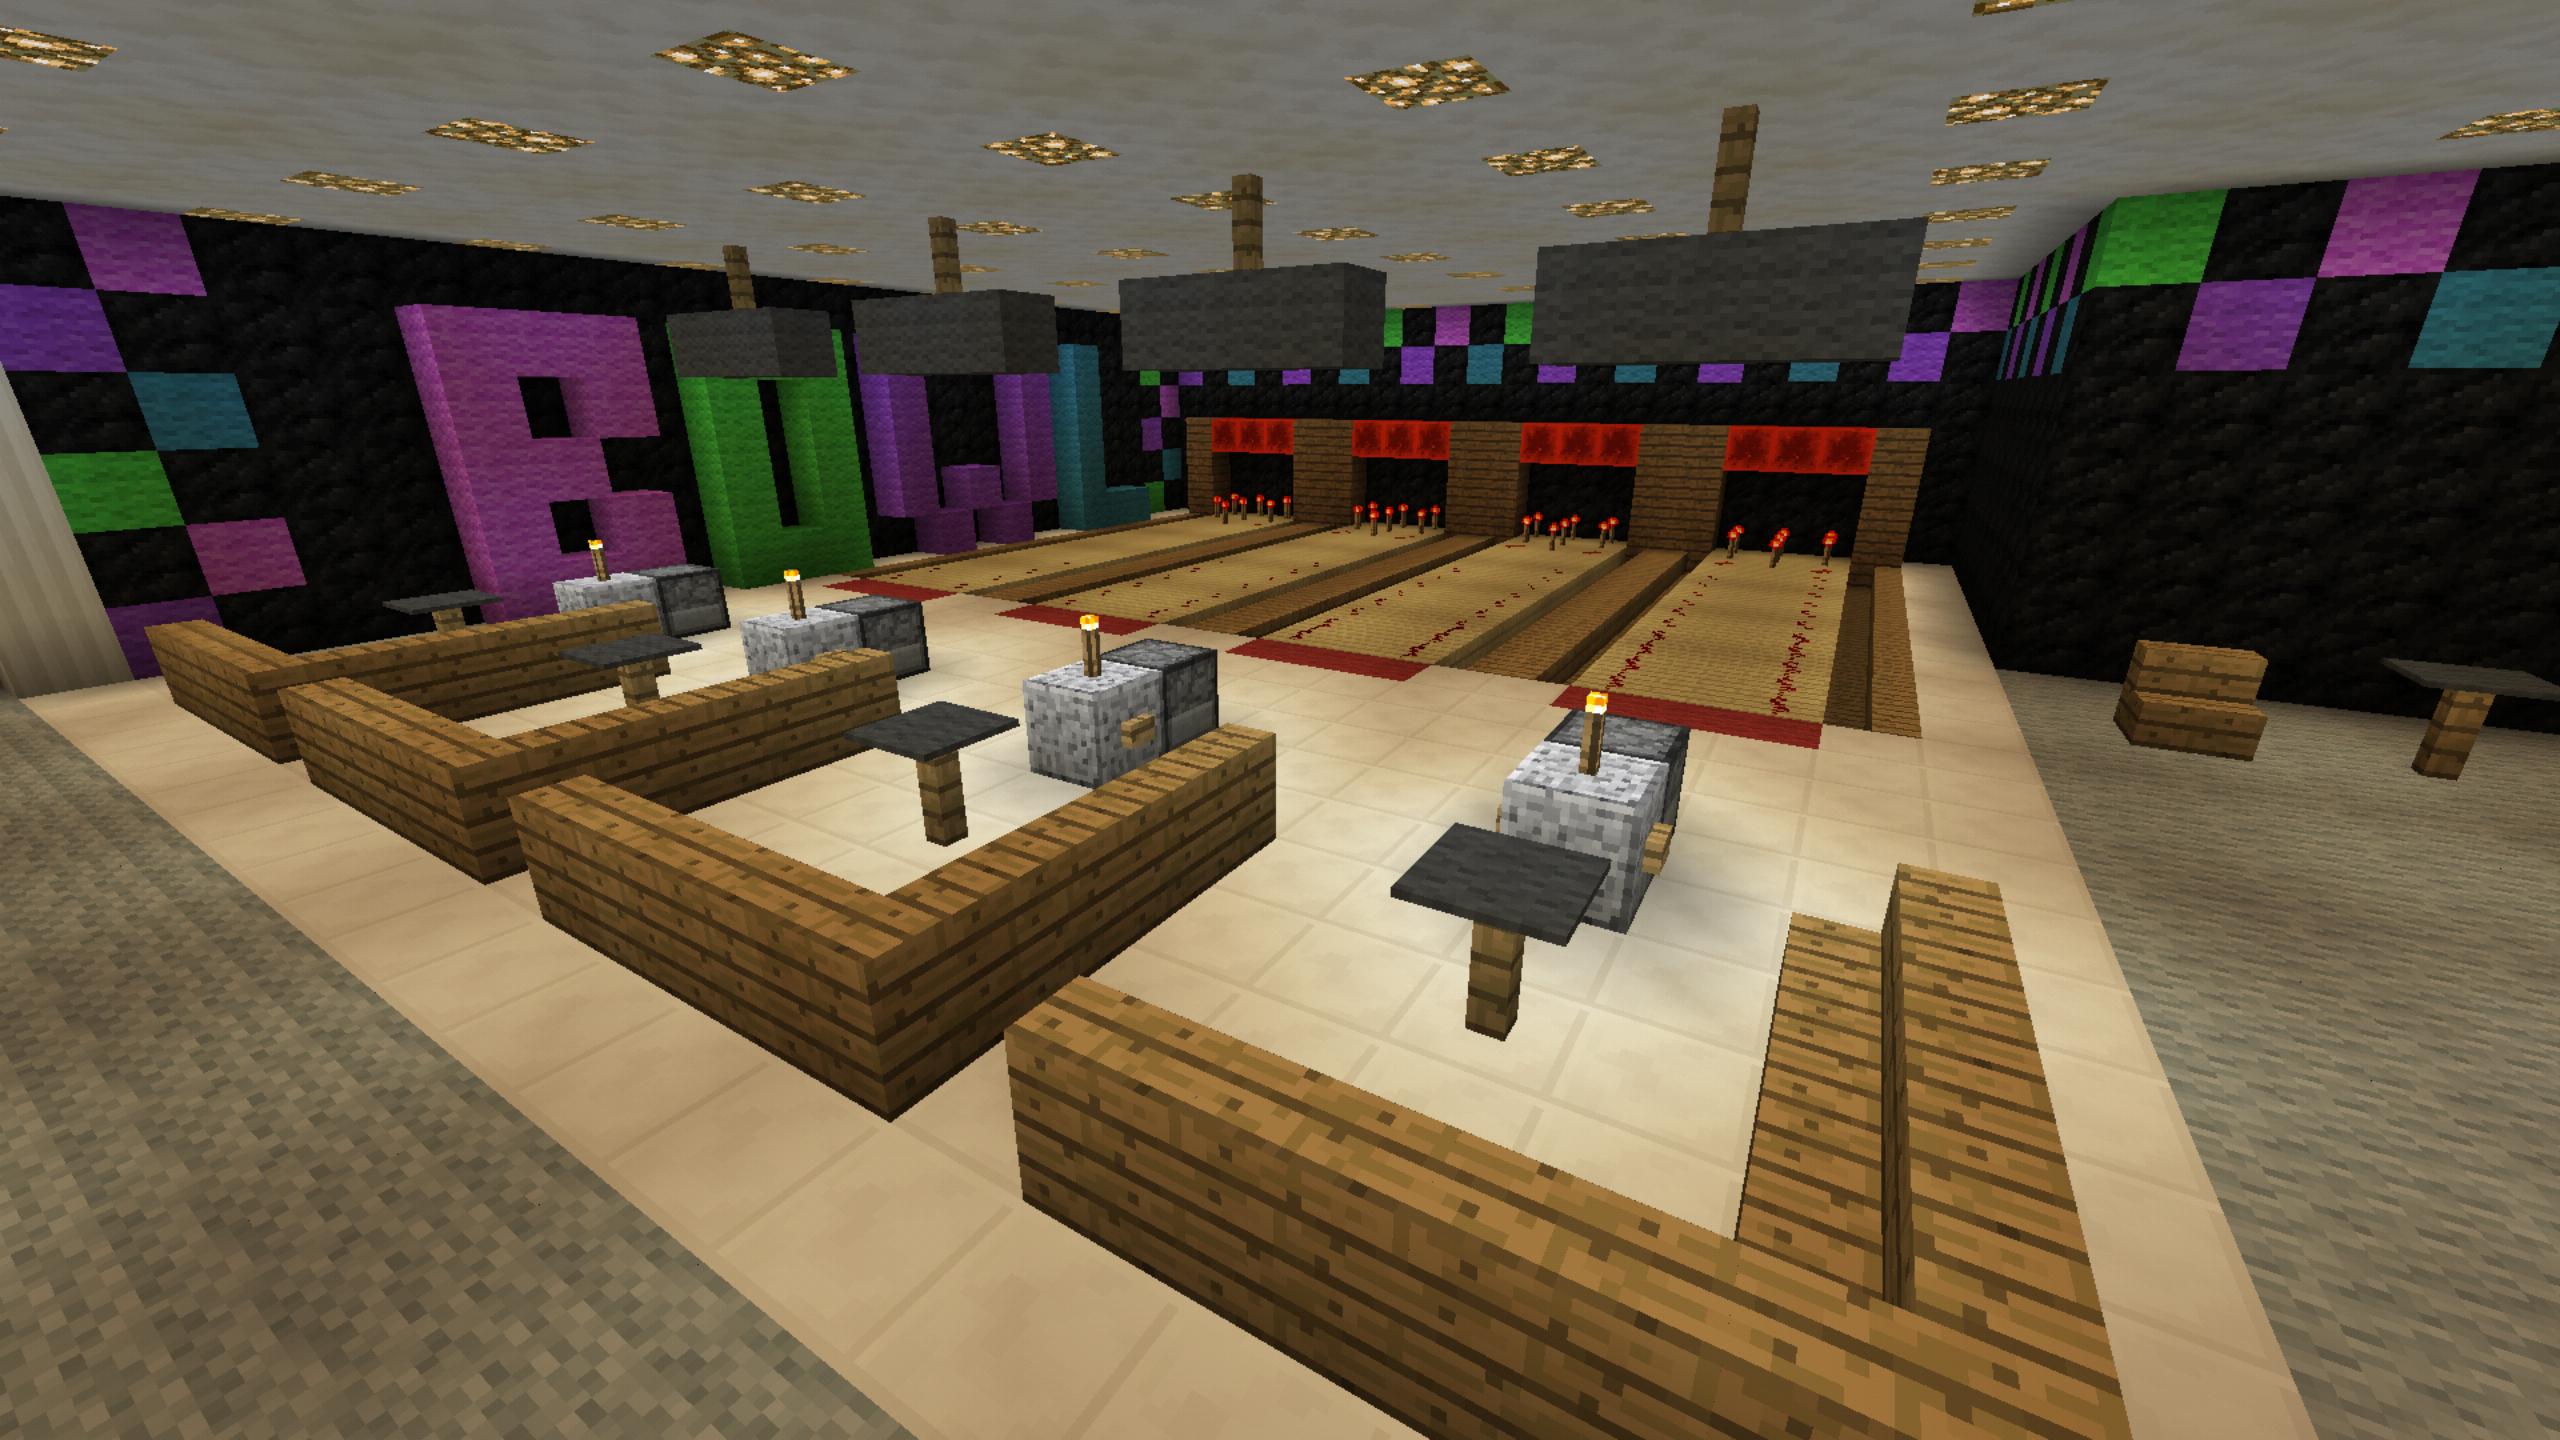 Minecraft Bowling Alley | Minecraft Creations | Pinterest ...